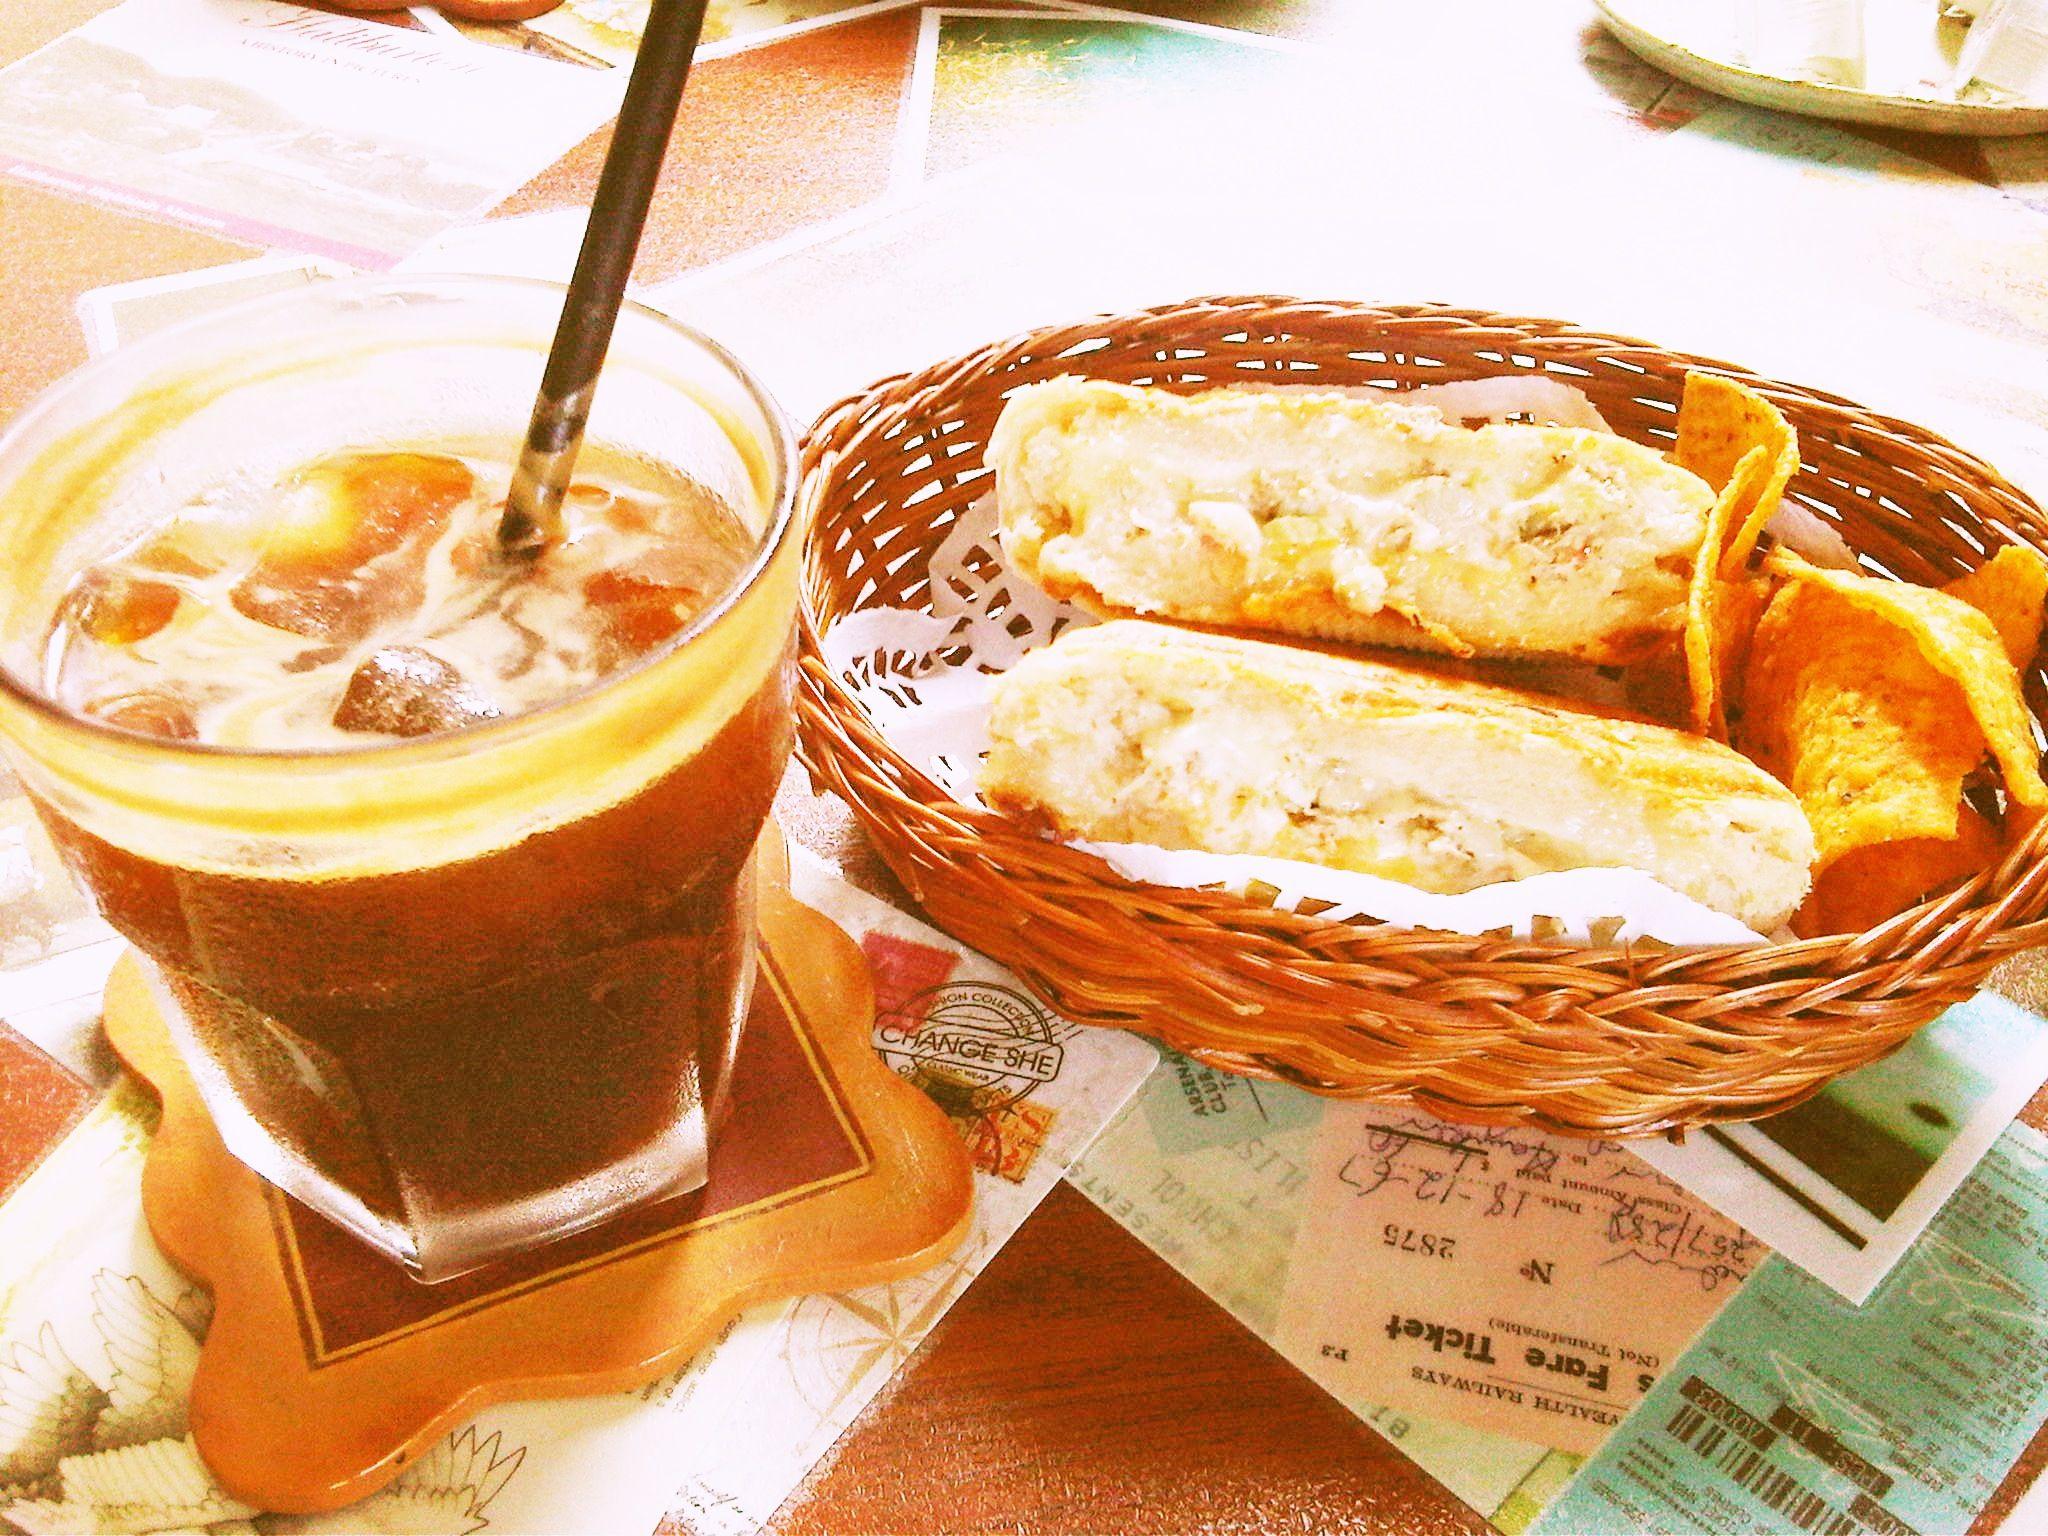 A wonderful morning with panini